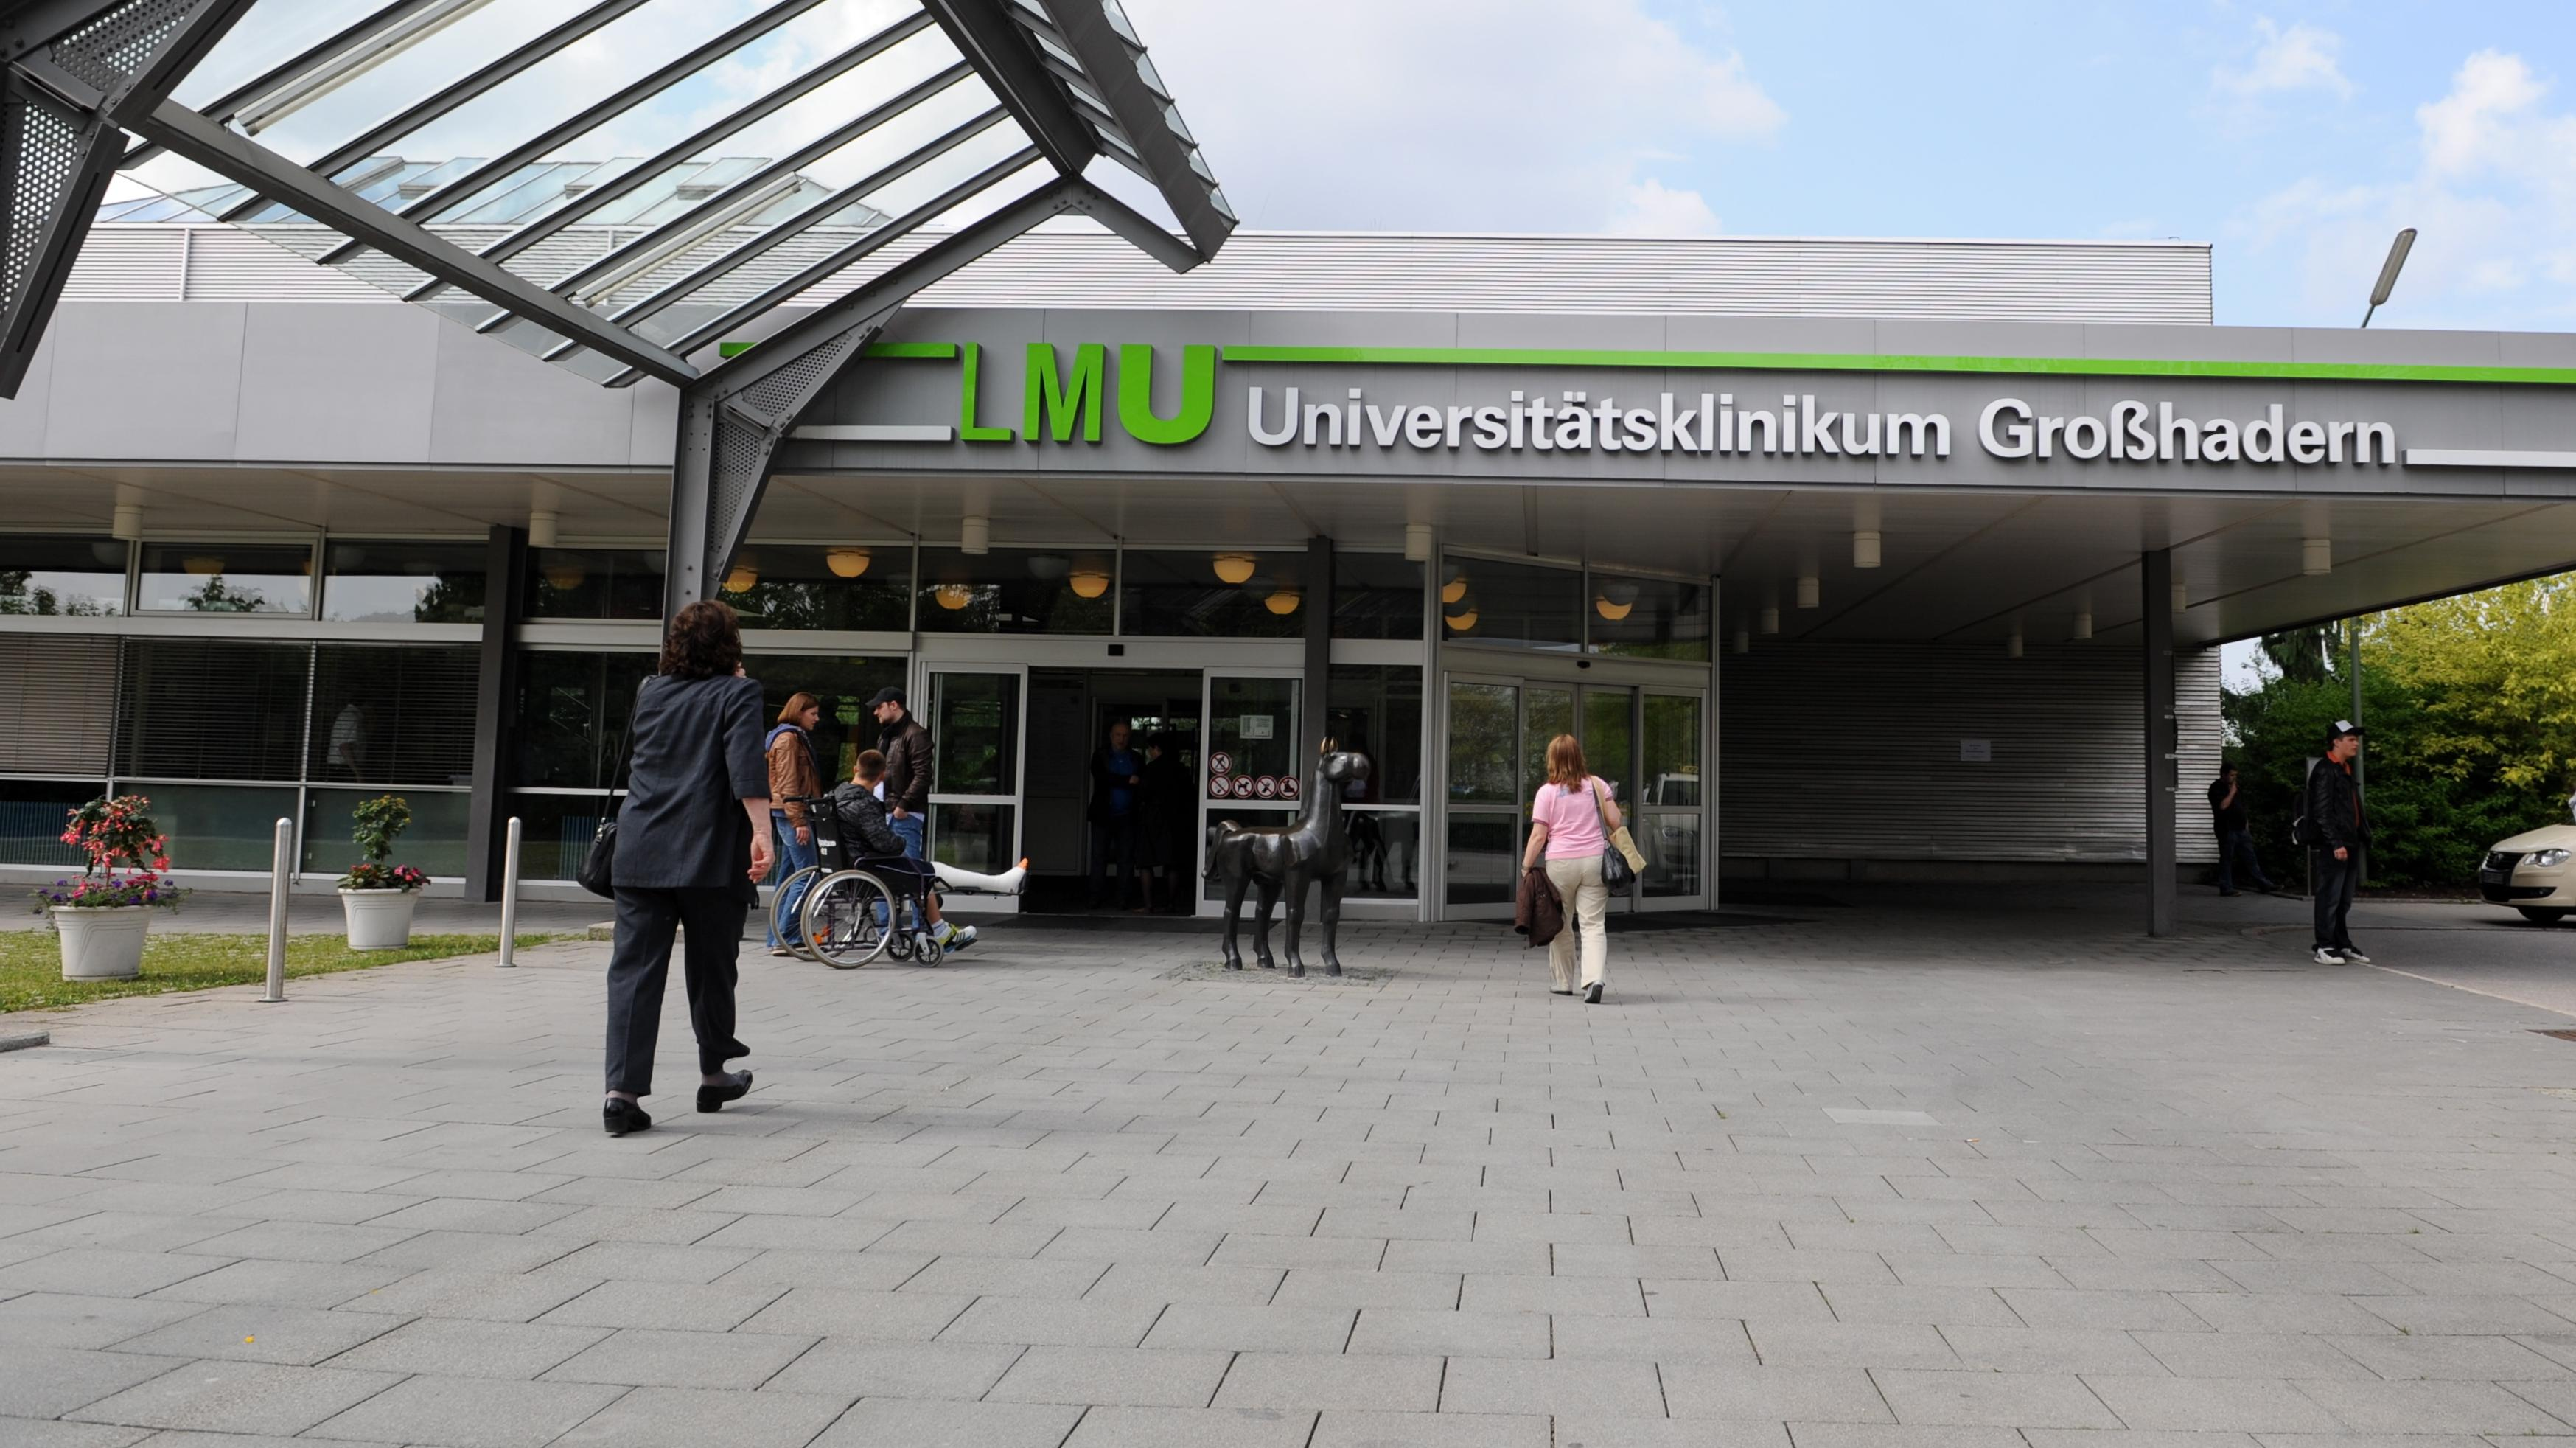 Haupteingang des Universitätsklinikums Großhadern